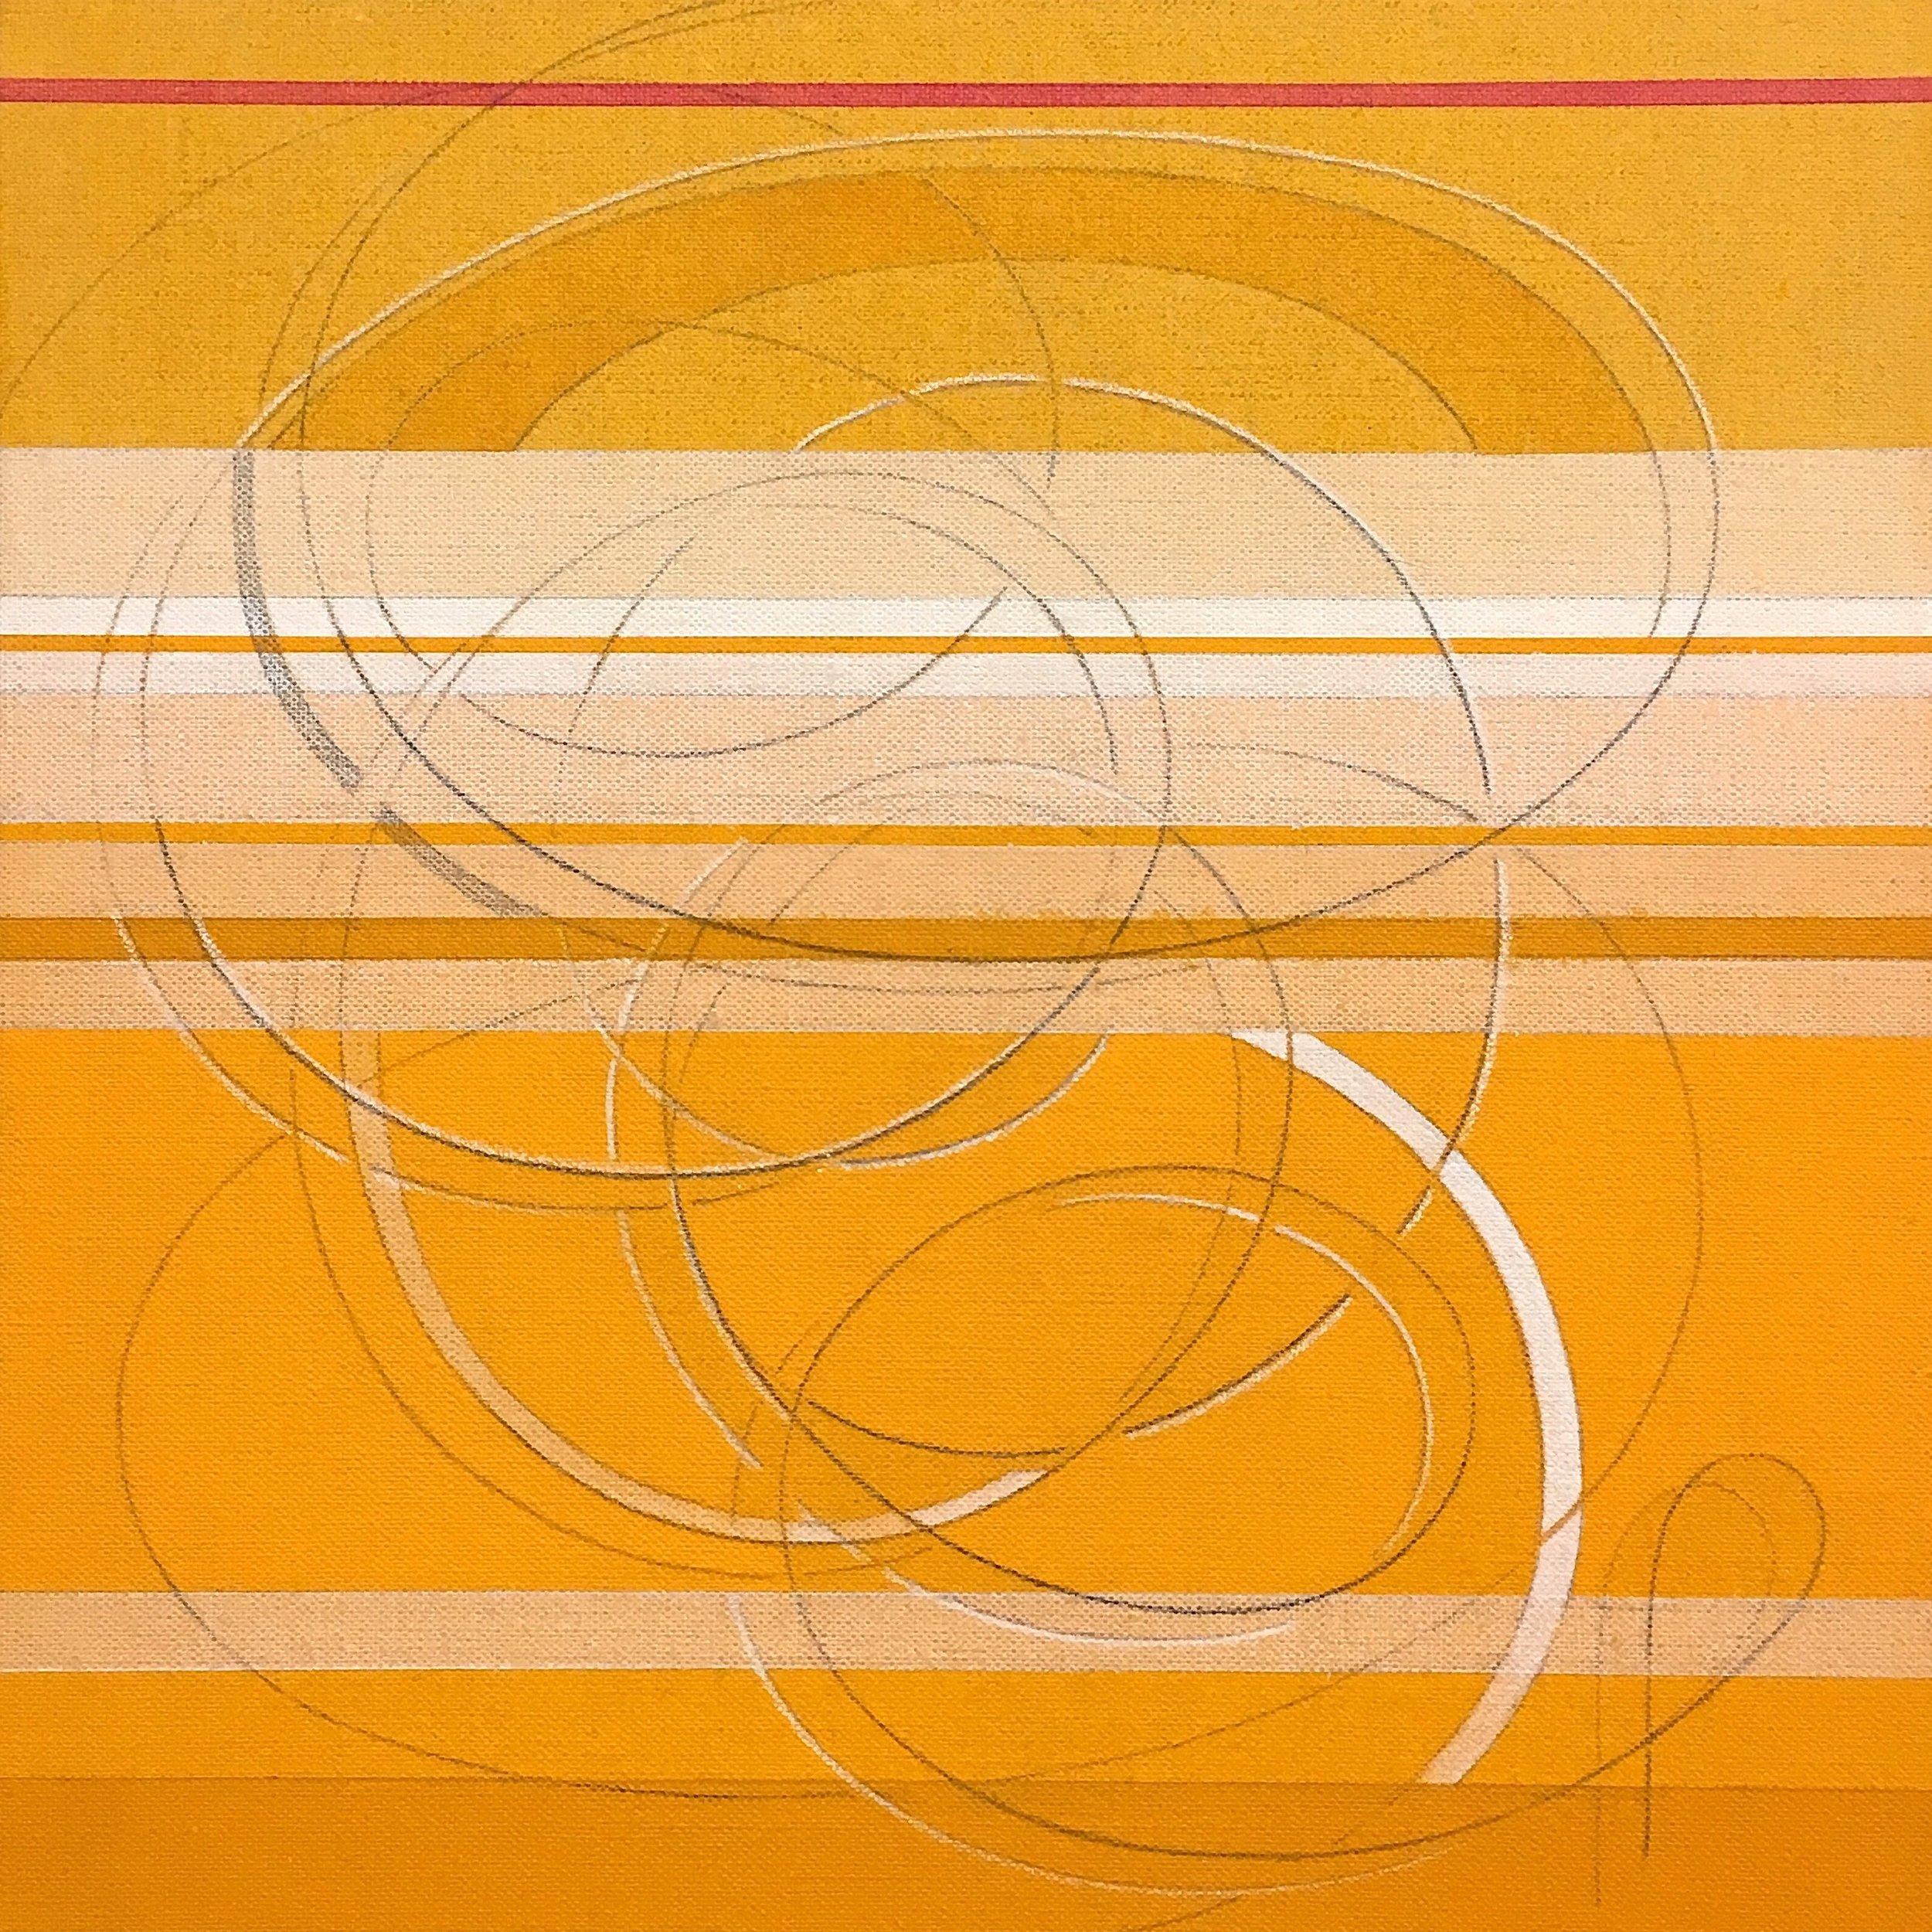 Every Other Line: Orange #1